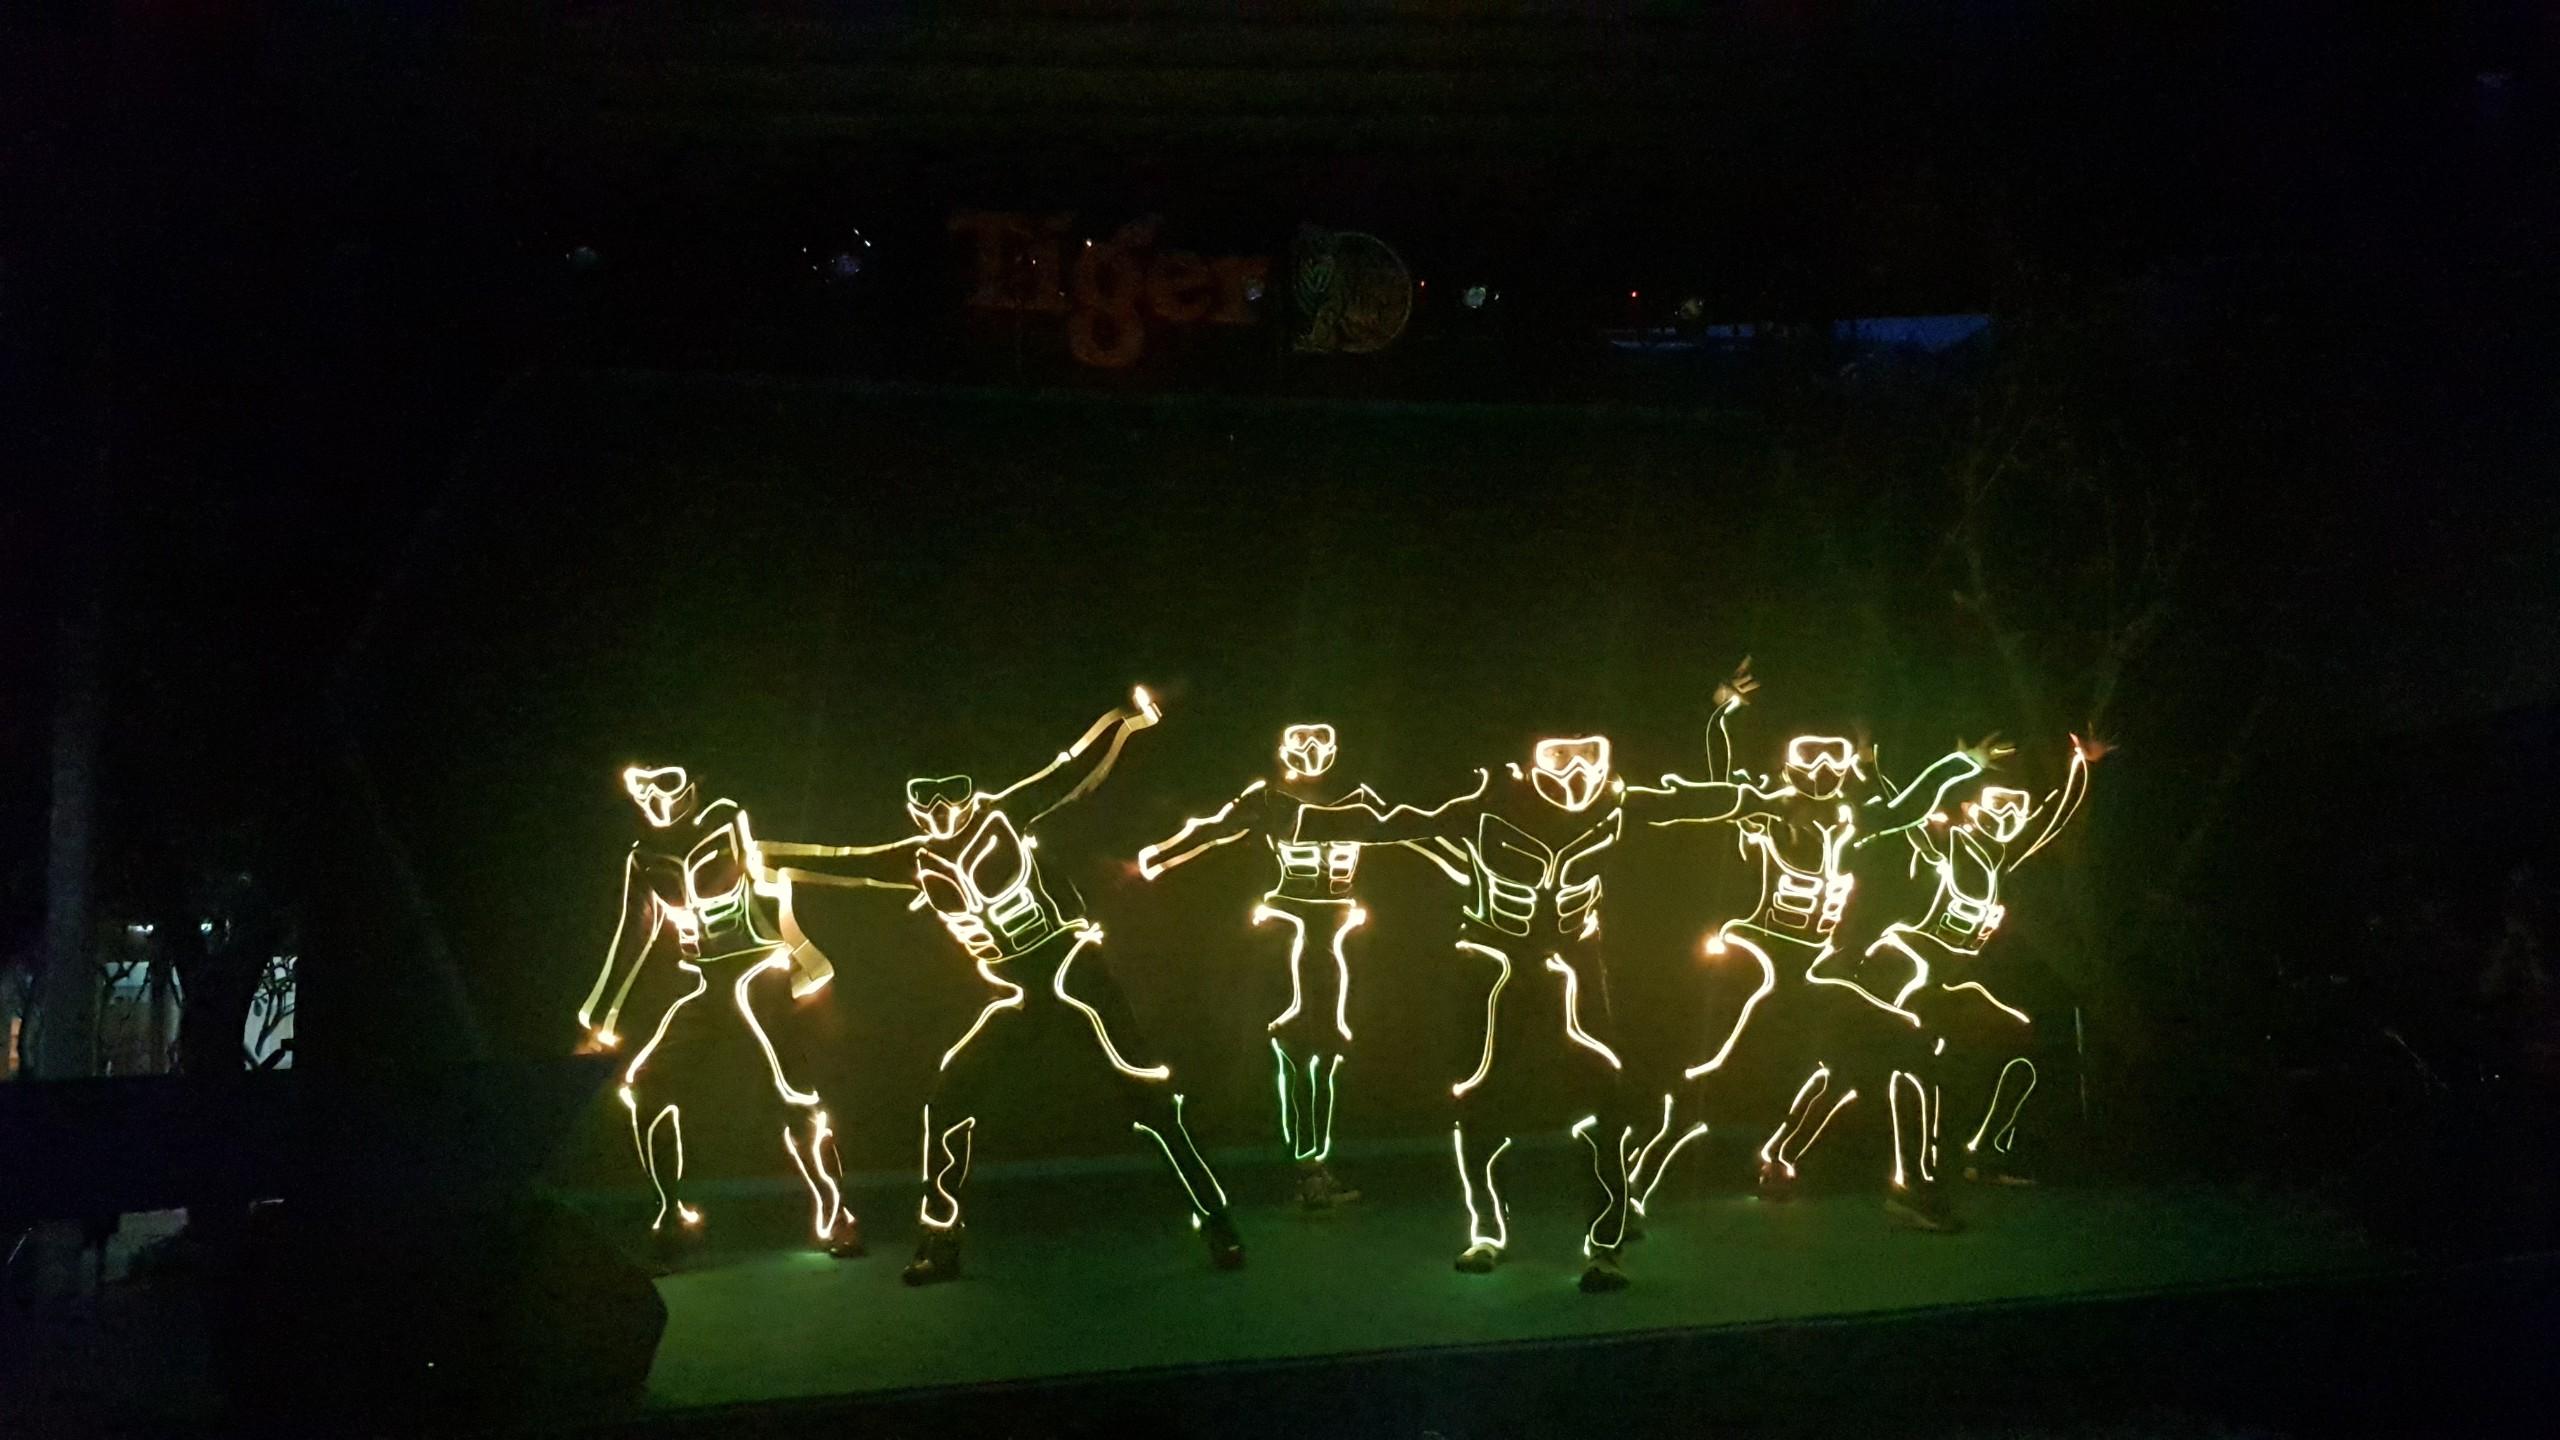 nhảy đèn led, nhay den led